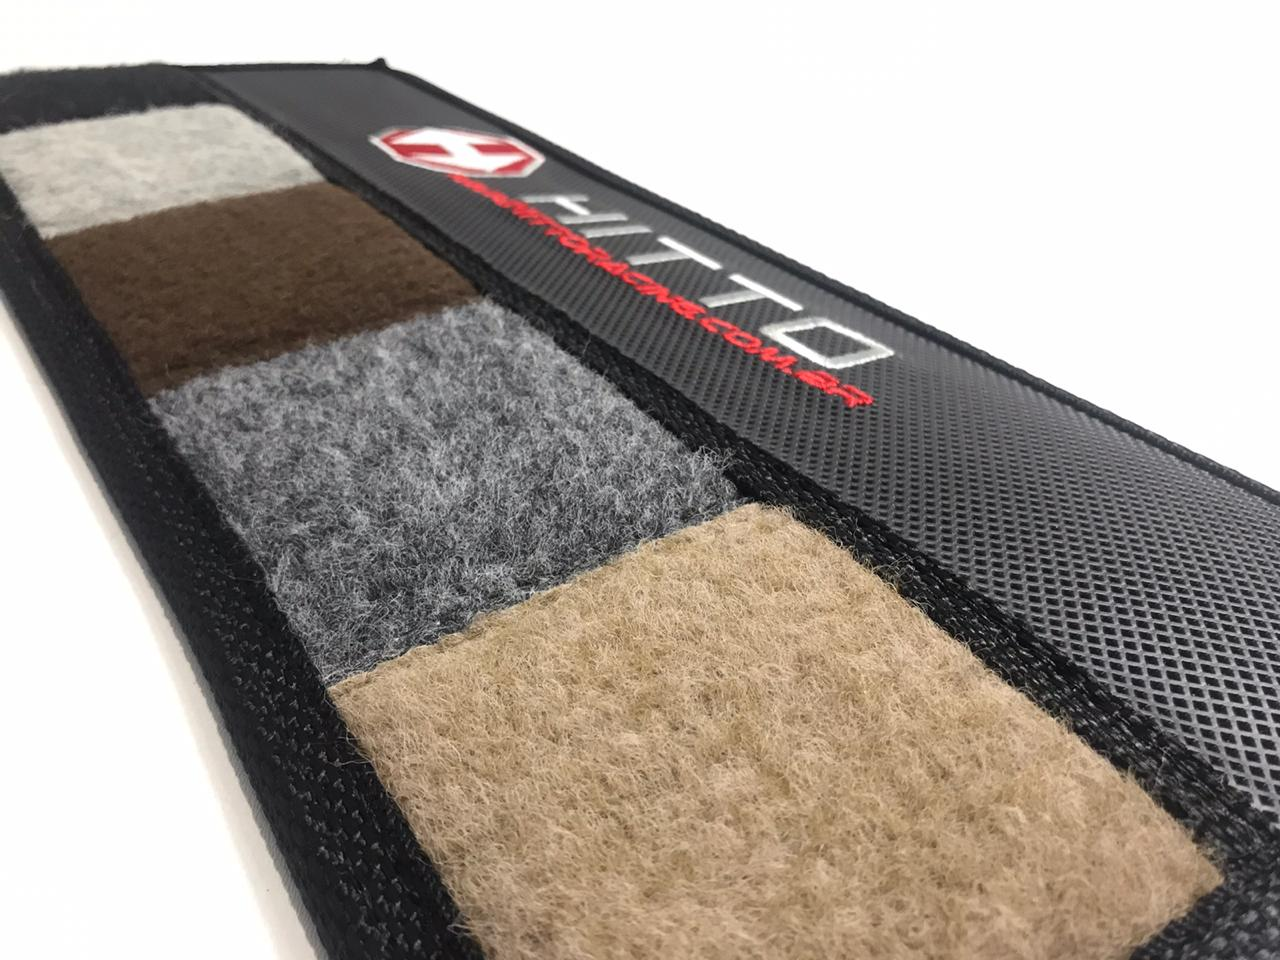 Tapete Toyota Rav4 Carpete Luxo Base Borracha Pinada